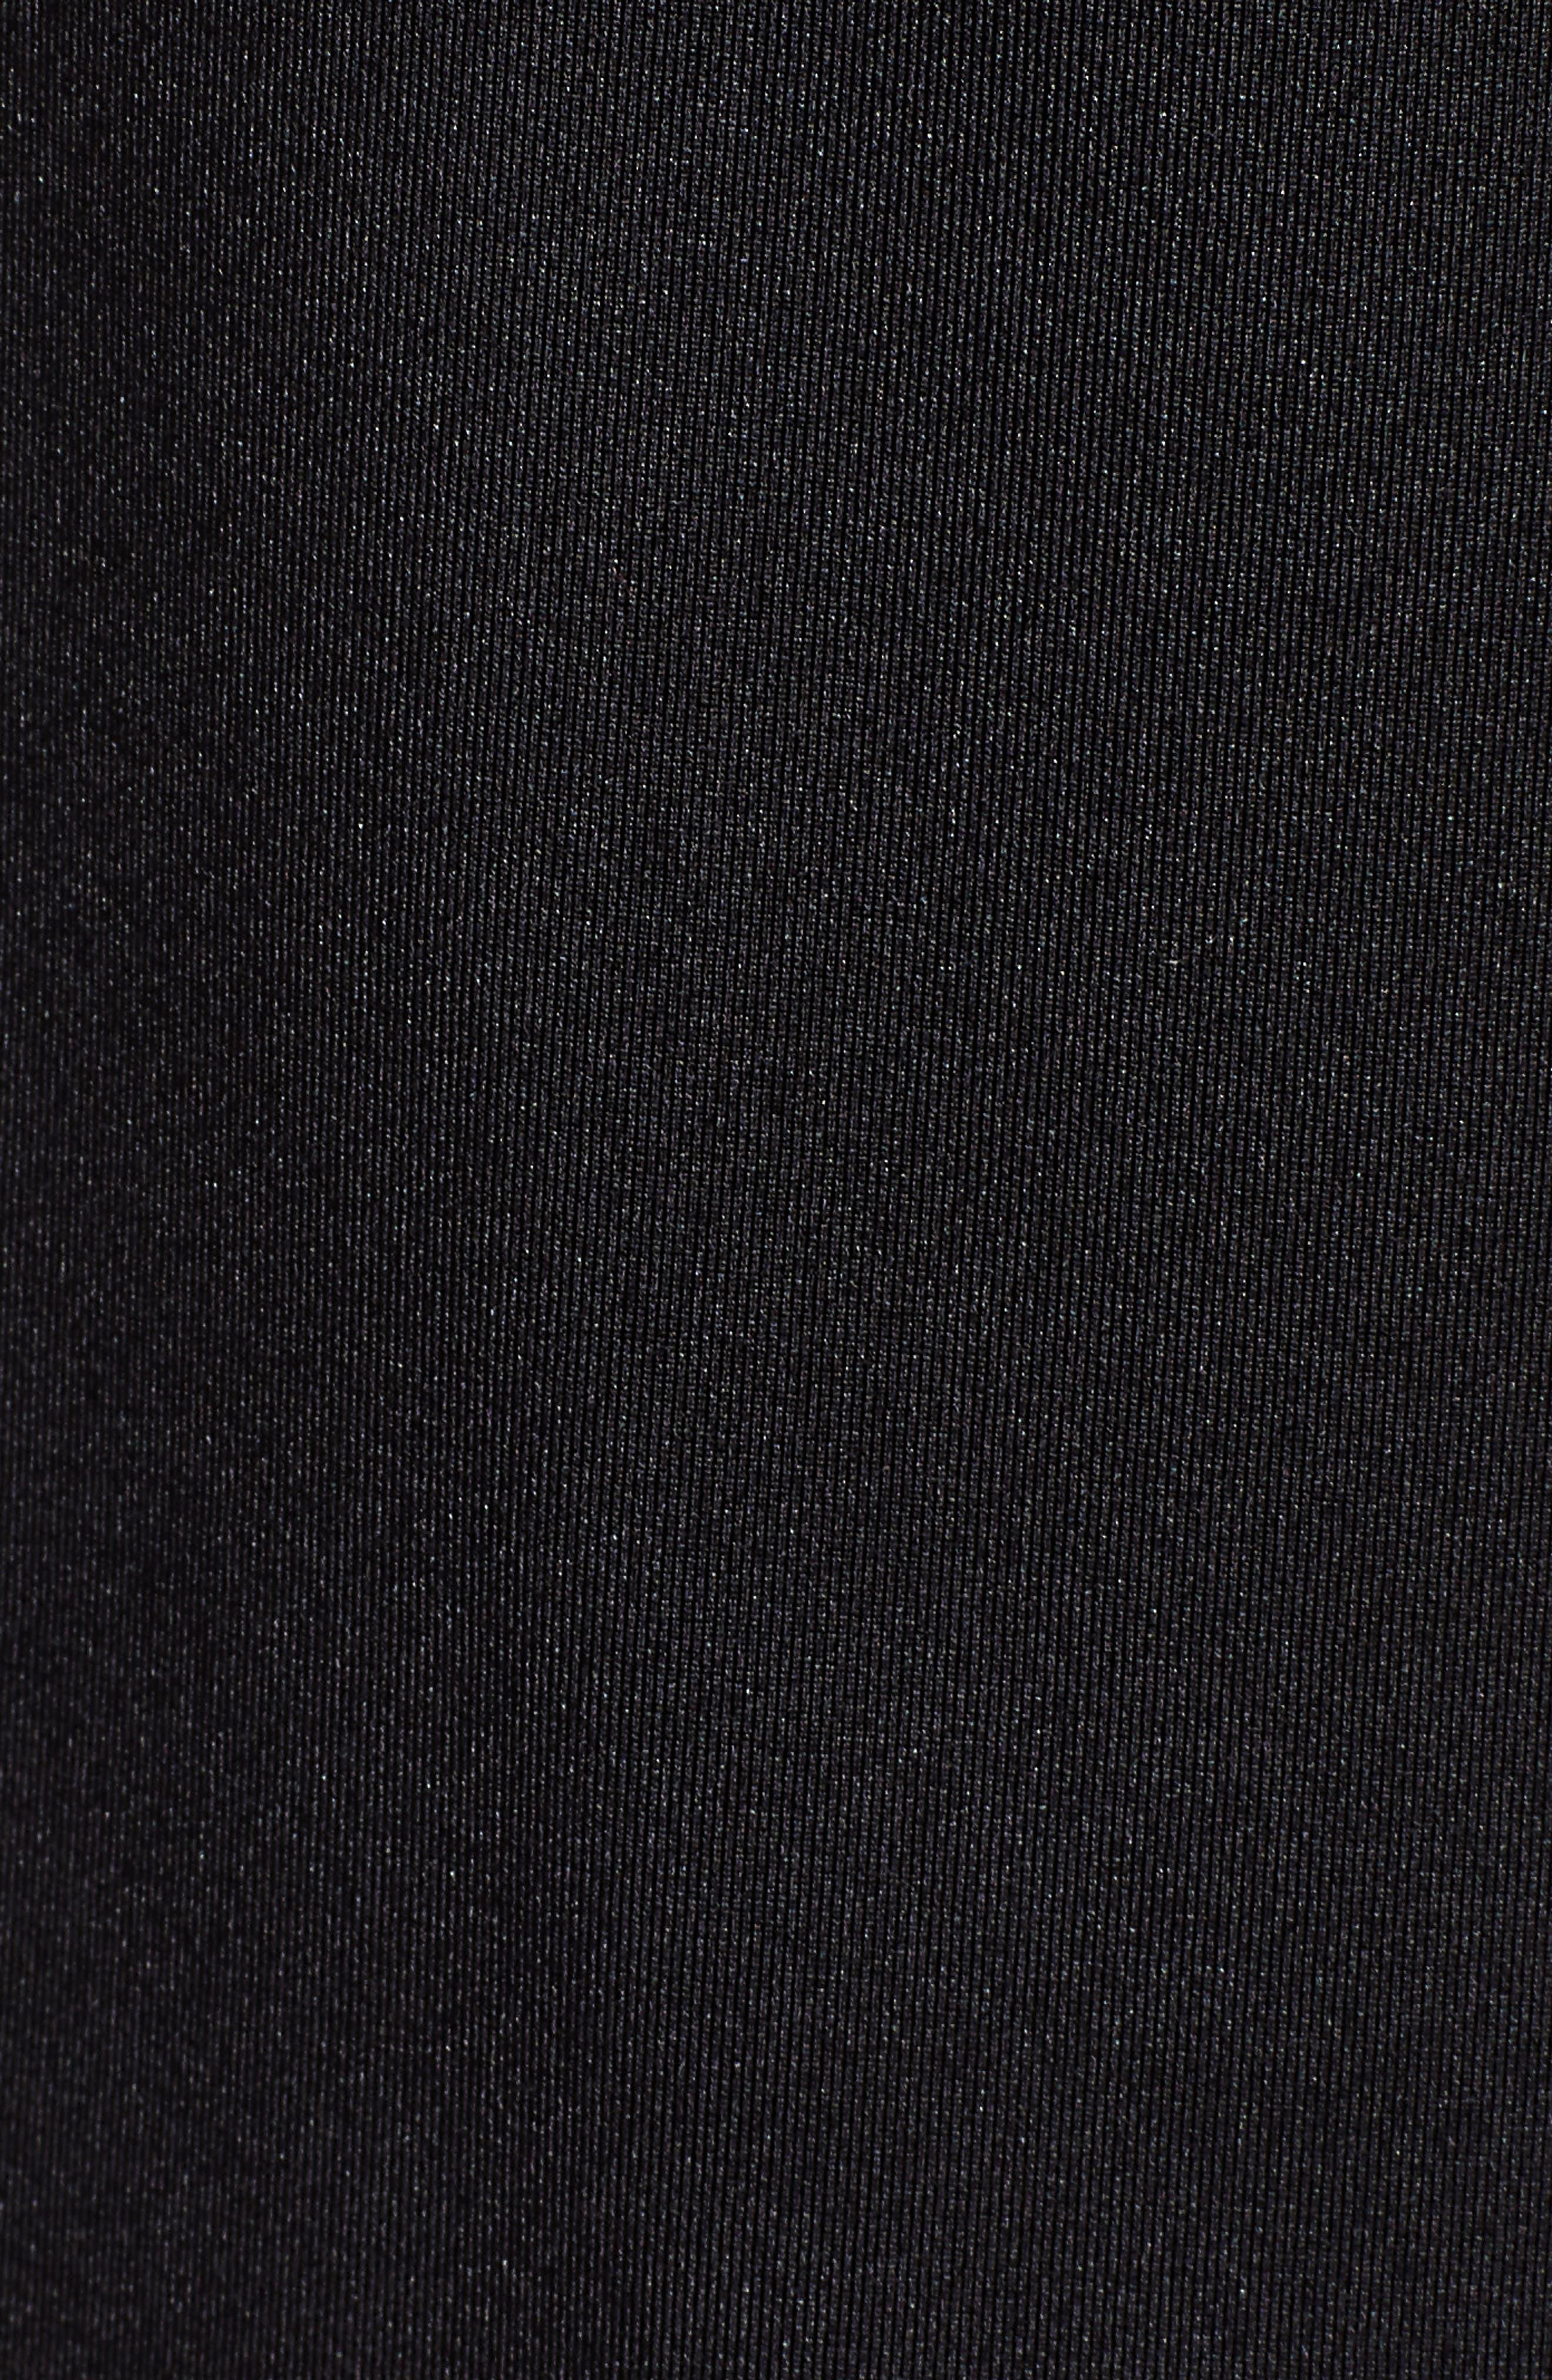 ROSEMUNDE, Billie Lace Trim Tank, Alternate thumbnail 5, color, BLACK